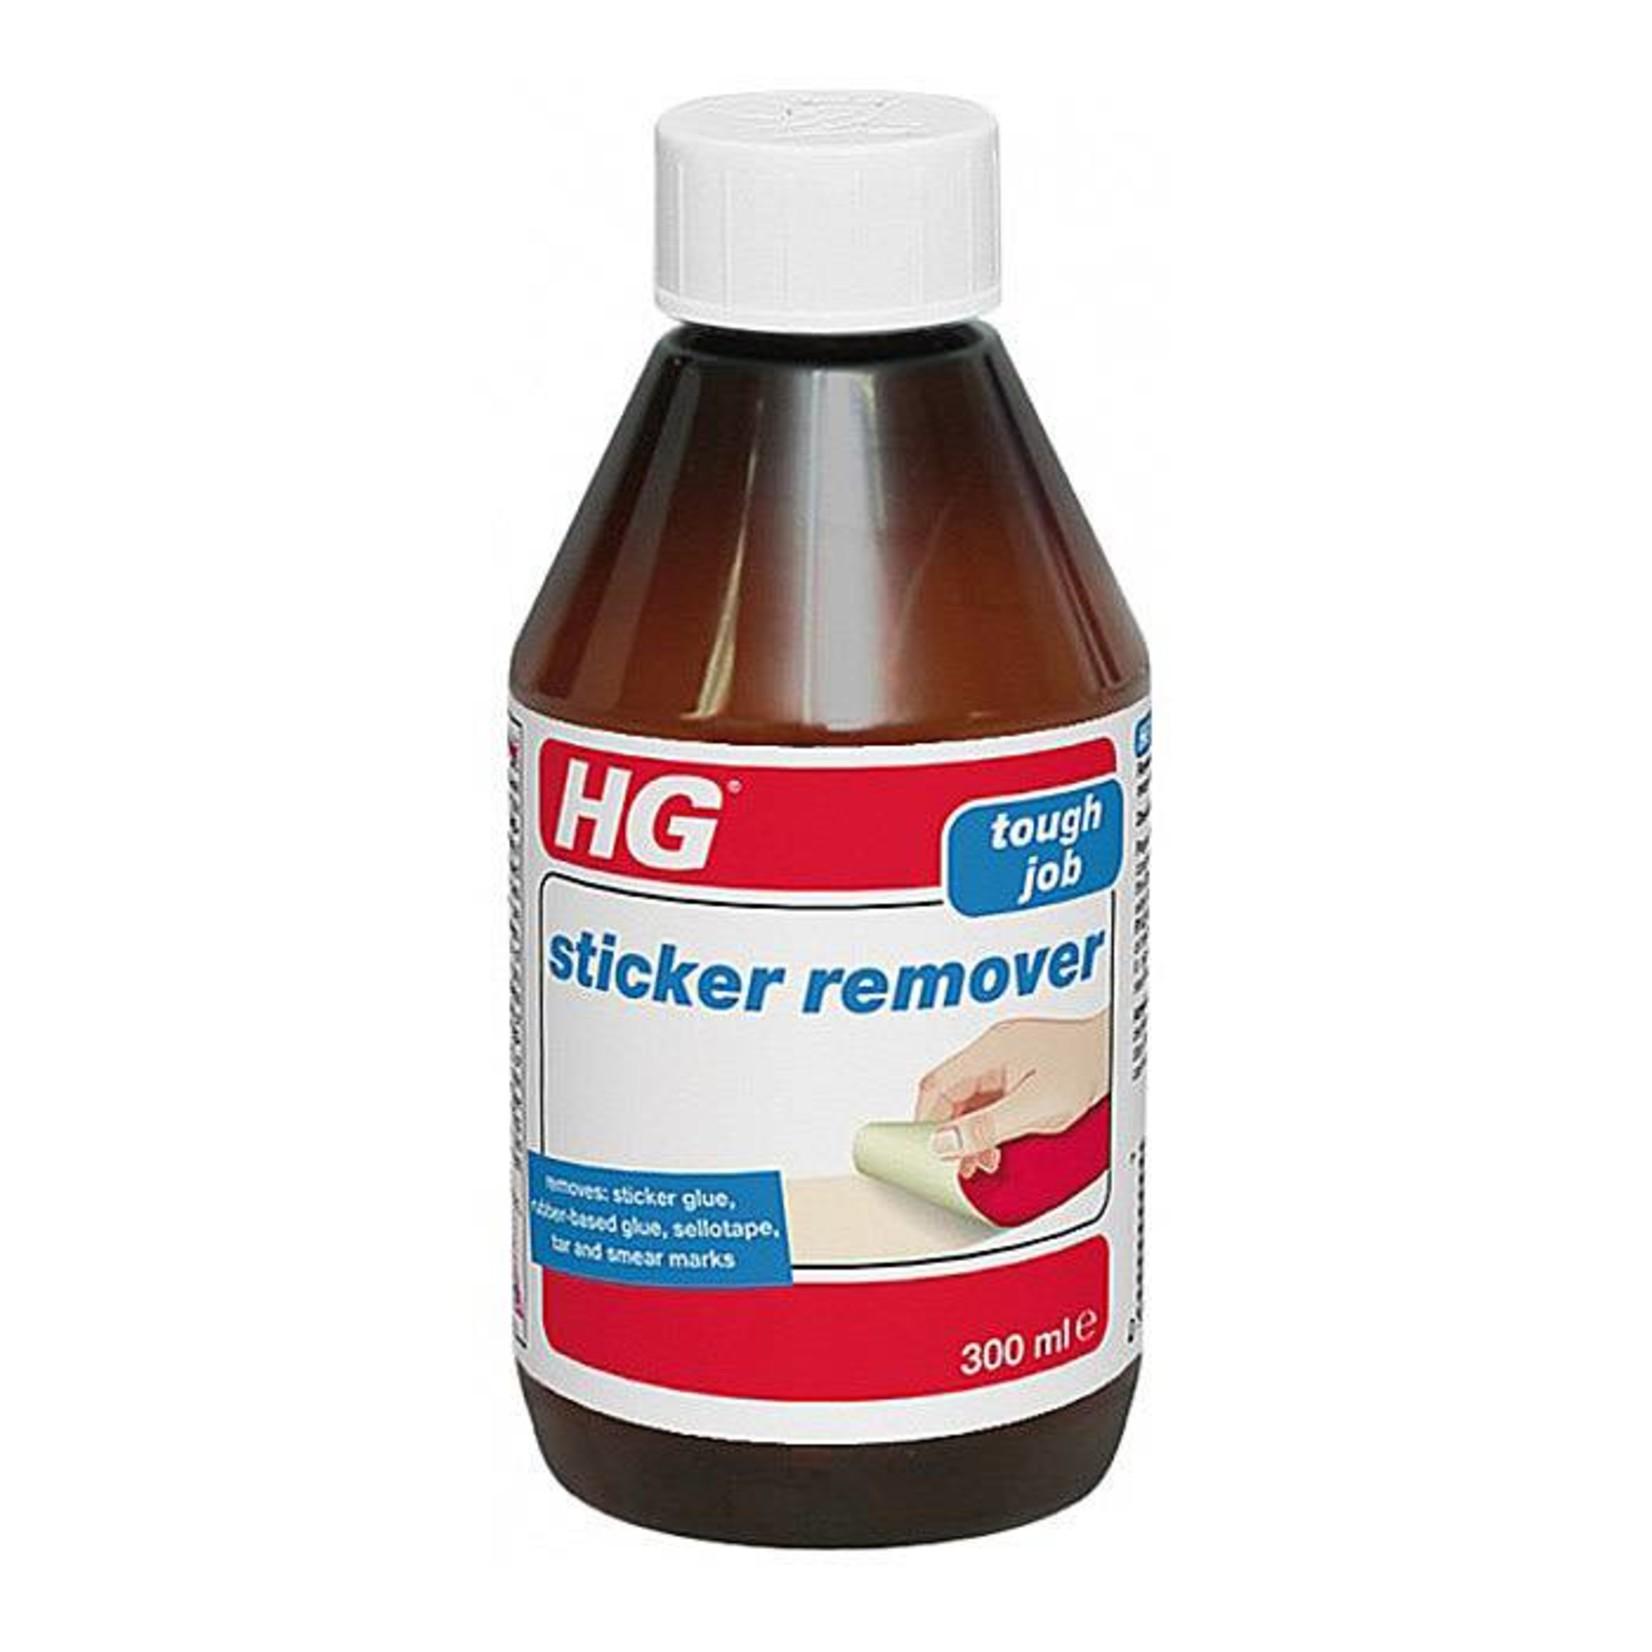 HG HG STICKER REMOVER TOUGH JOB GLUE, SELLOTAPE, TAR & MARKS 300ML